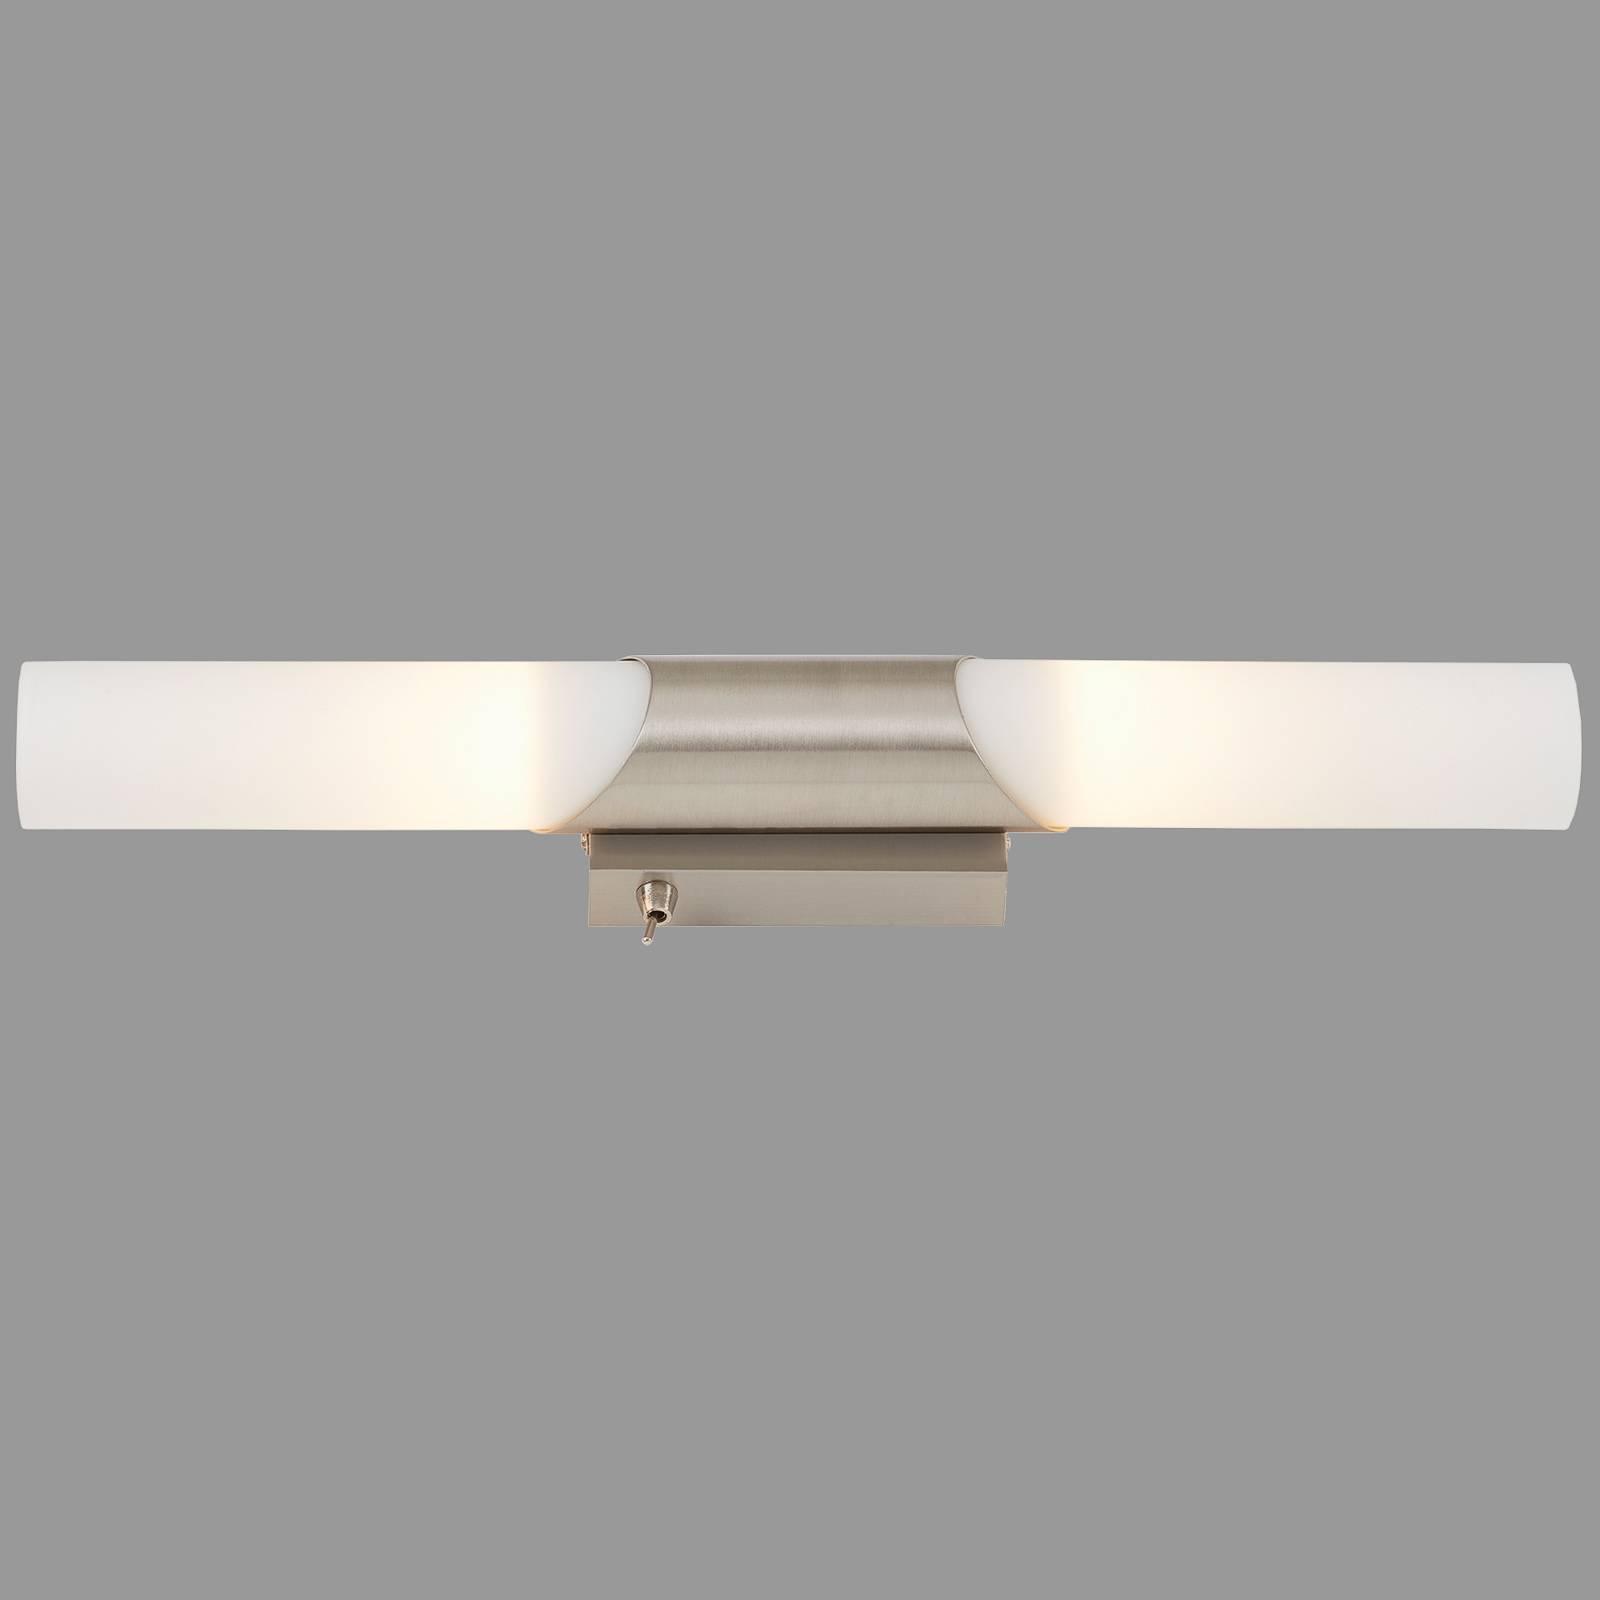 Badkamer wandlamp Splash, 2-lamps, mat nikkel